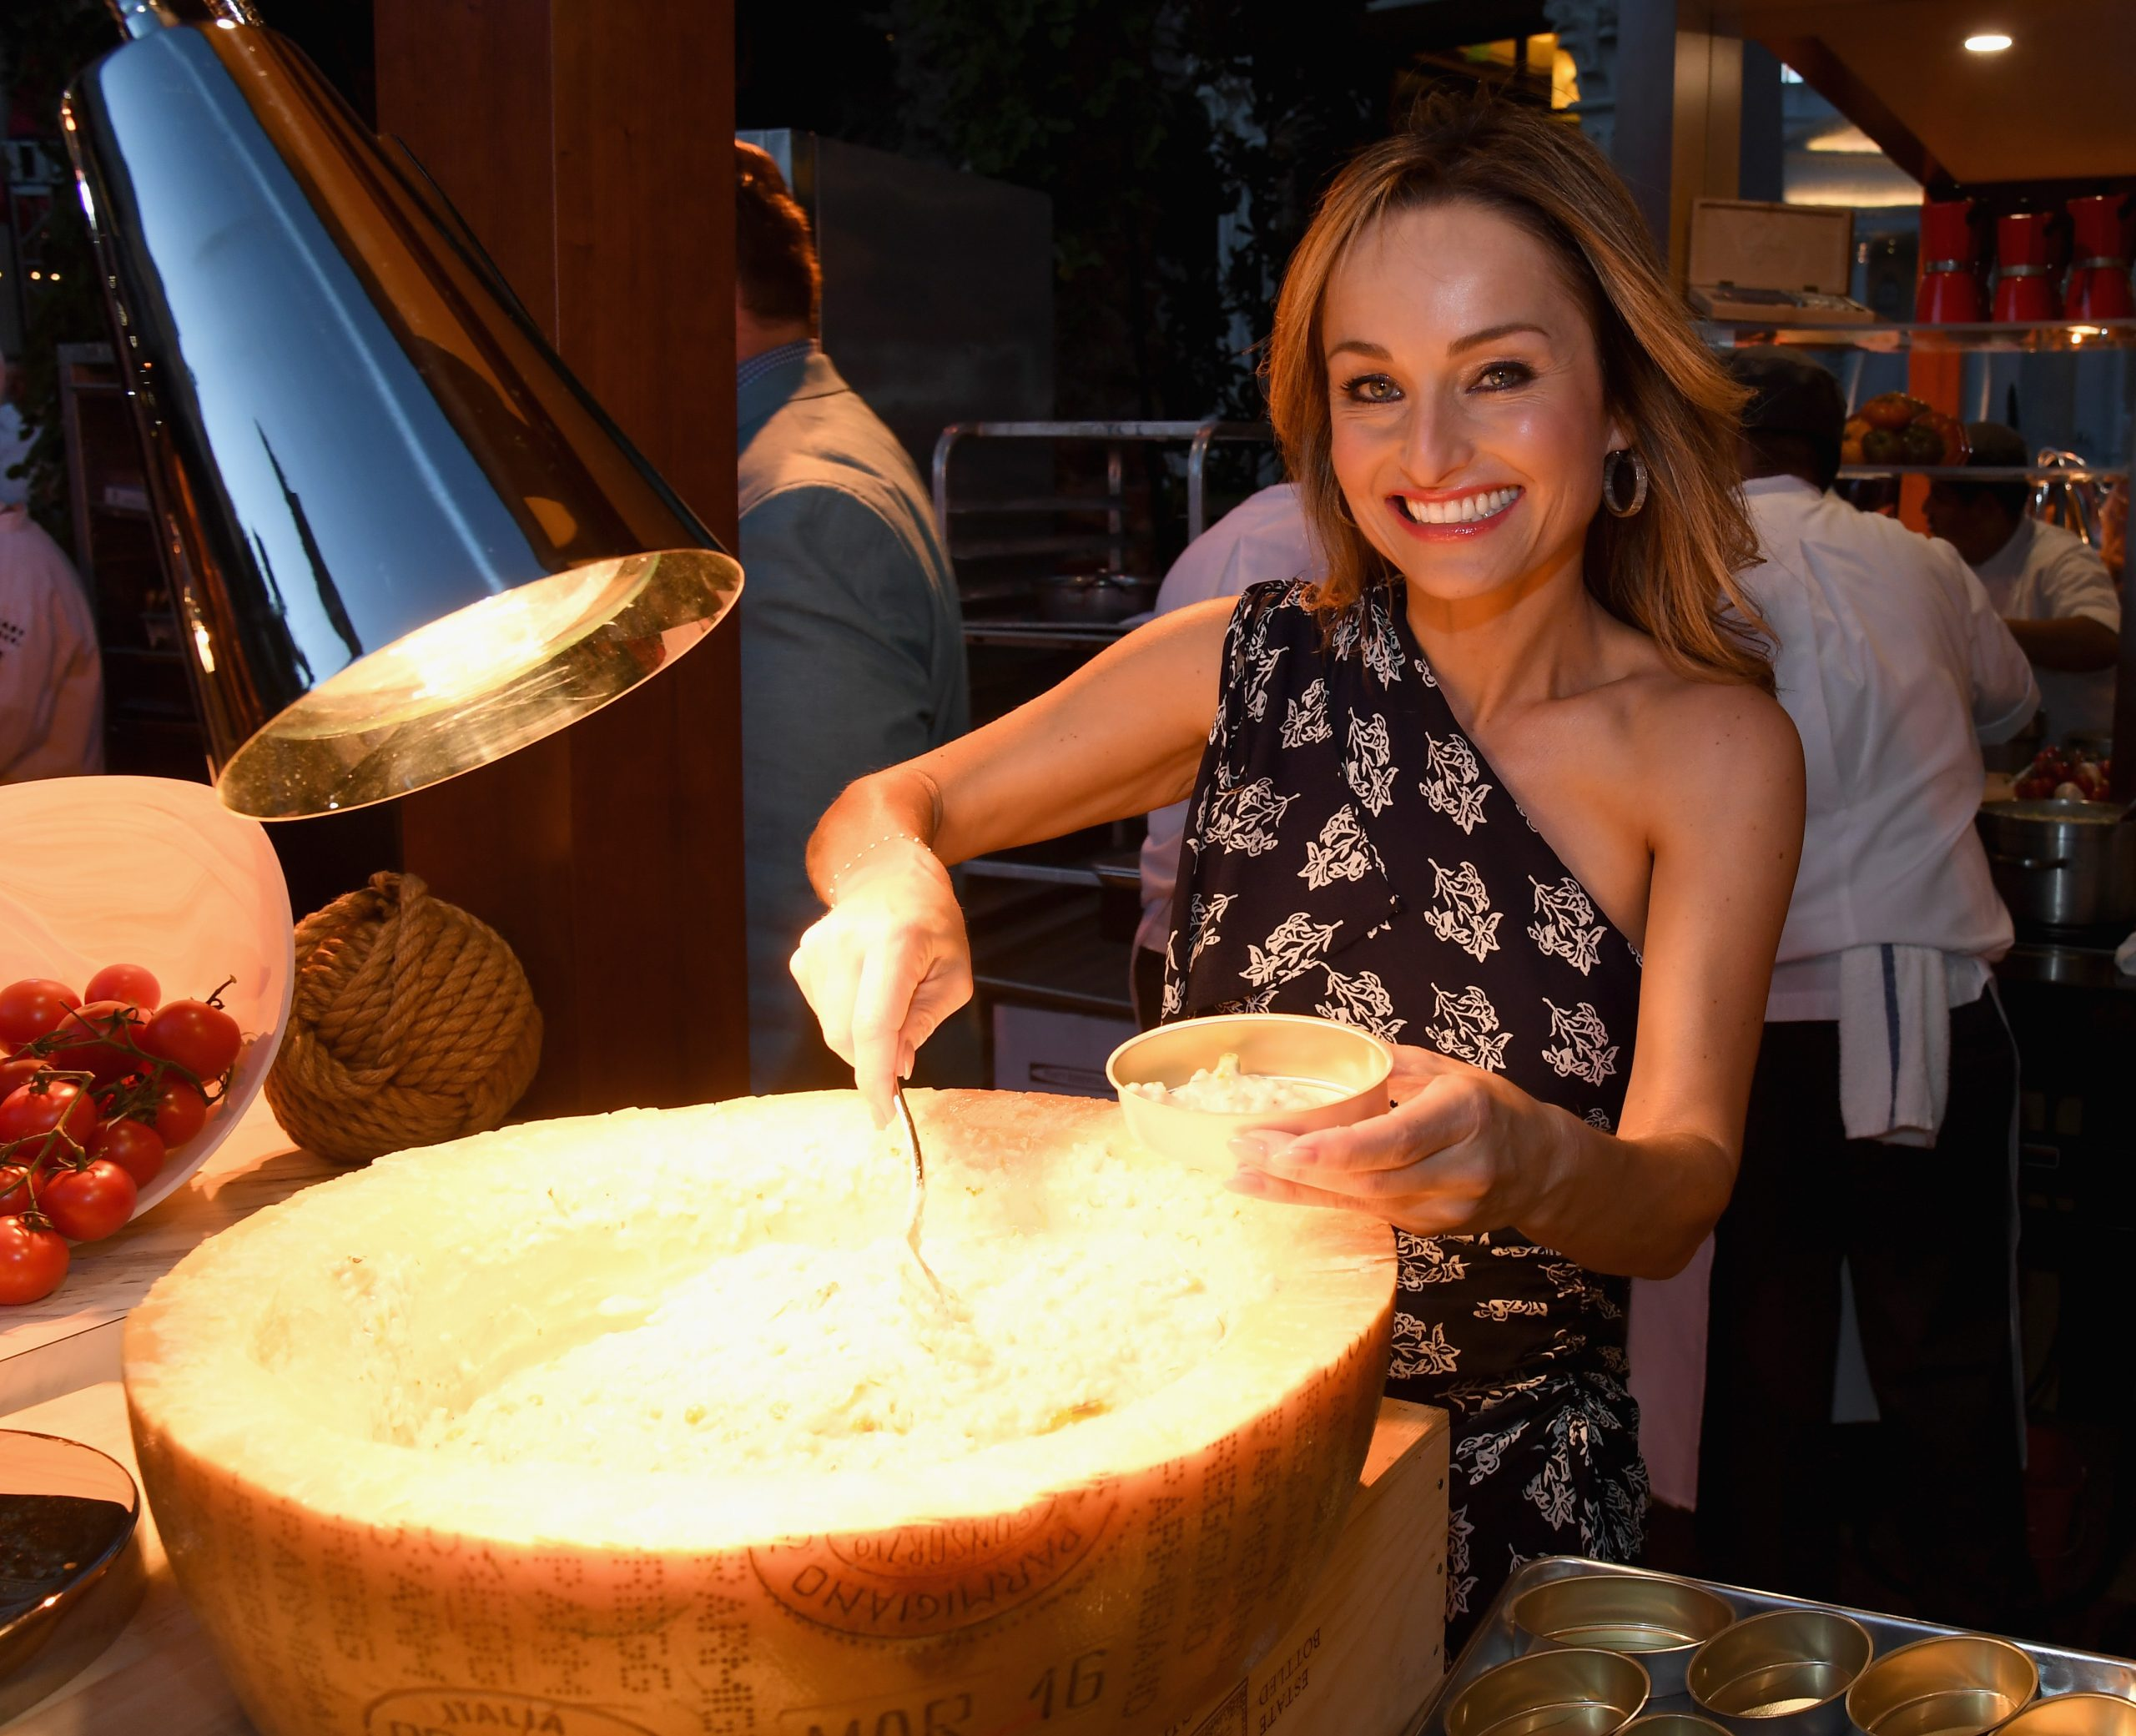 Food Network star Giada De Laurentiis prepares a meal at her Las Vegas restaurant, Giada, in 2018 wearing an off-the-shoulder print top.